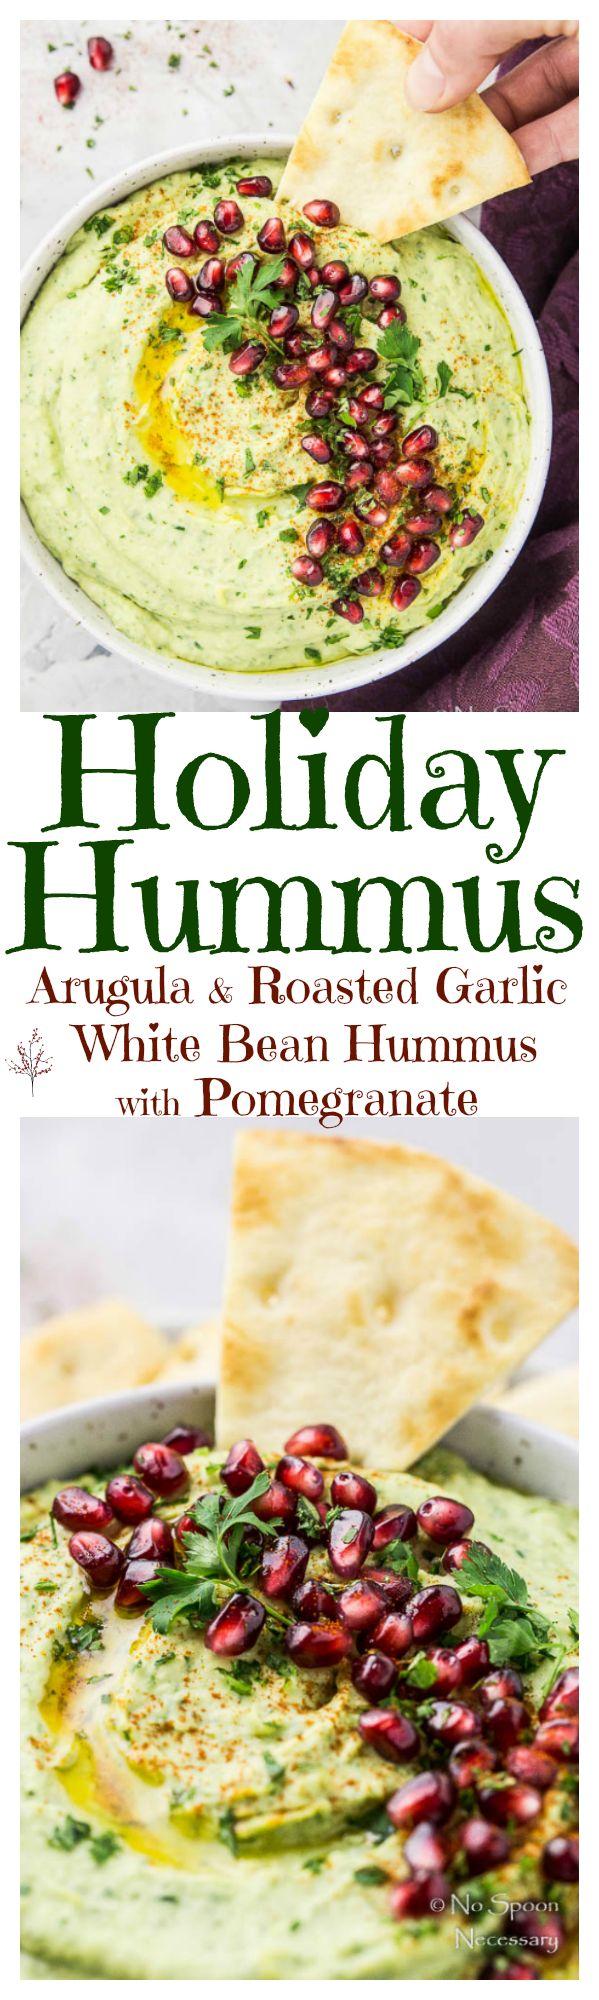 Holiday Hummus {Arugula & Roasted Garlic White Bean Hummus with Pomegranate}